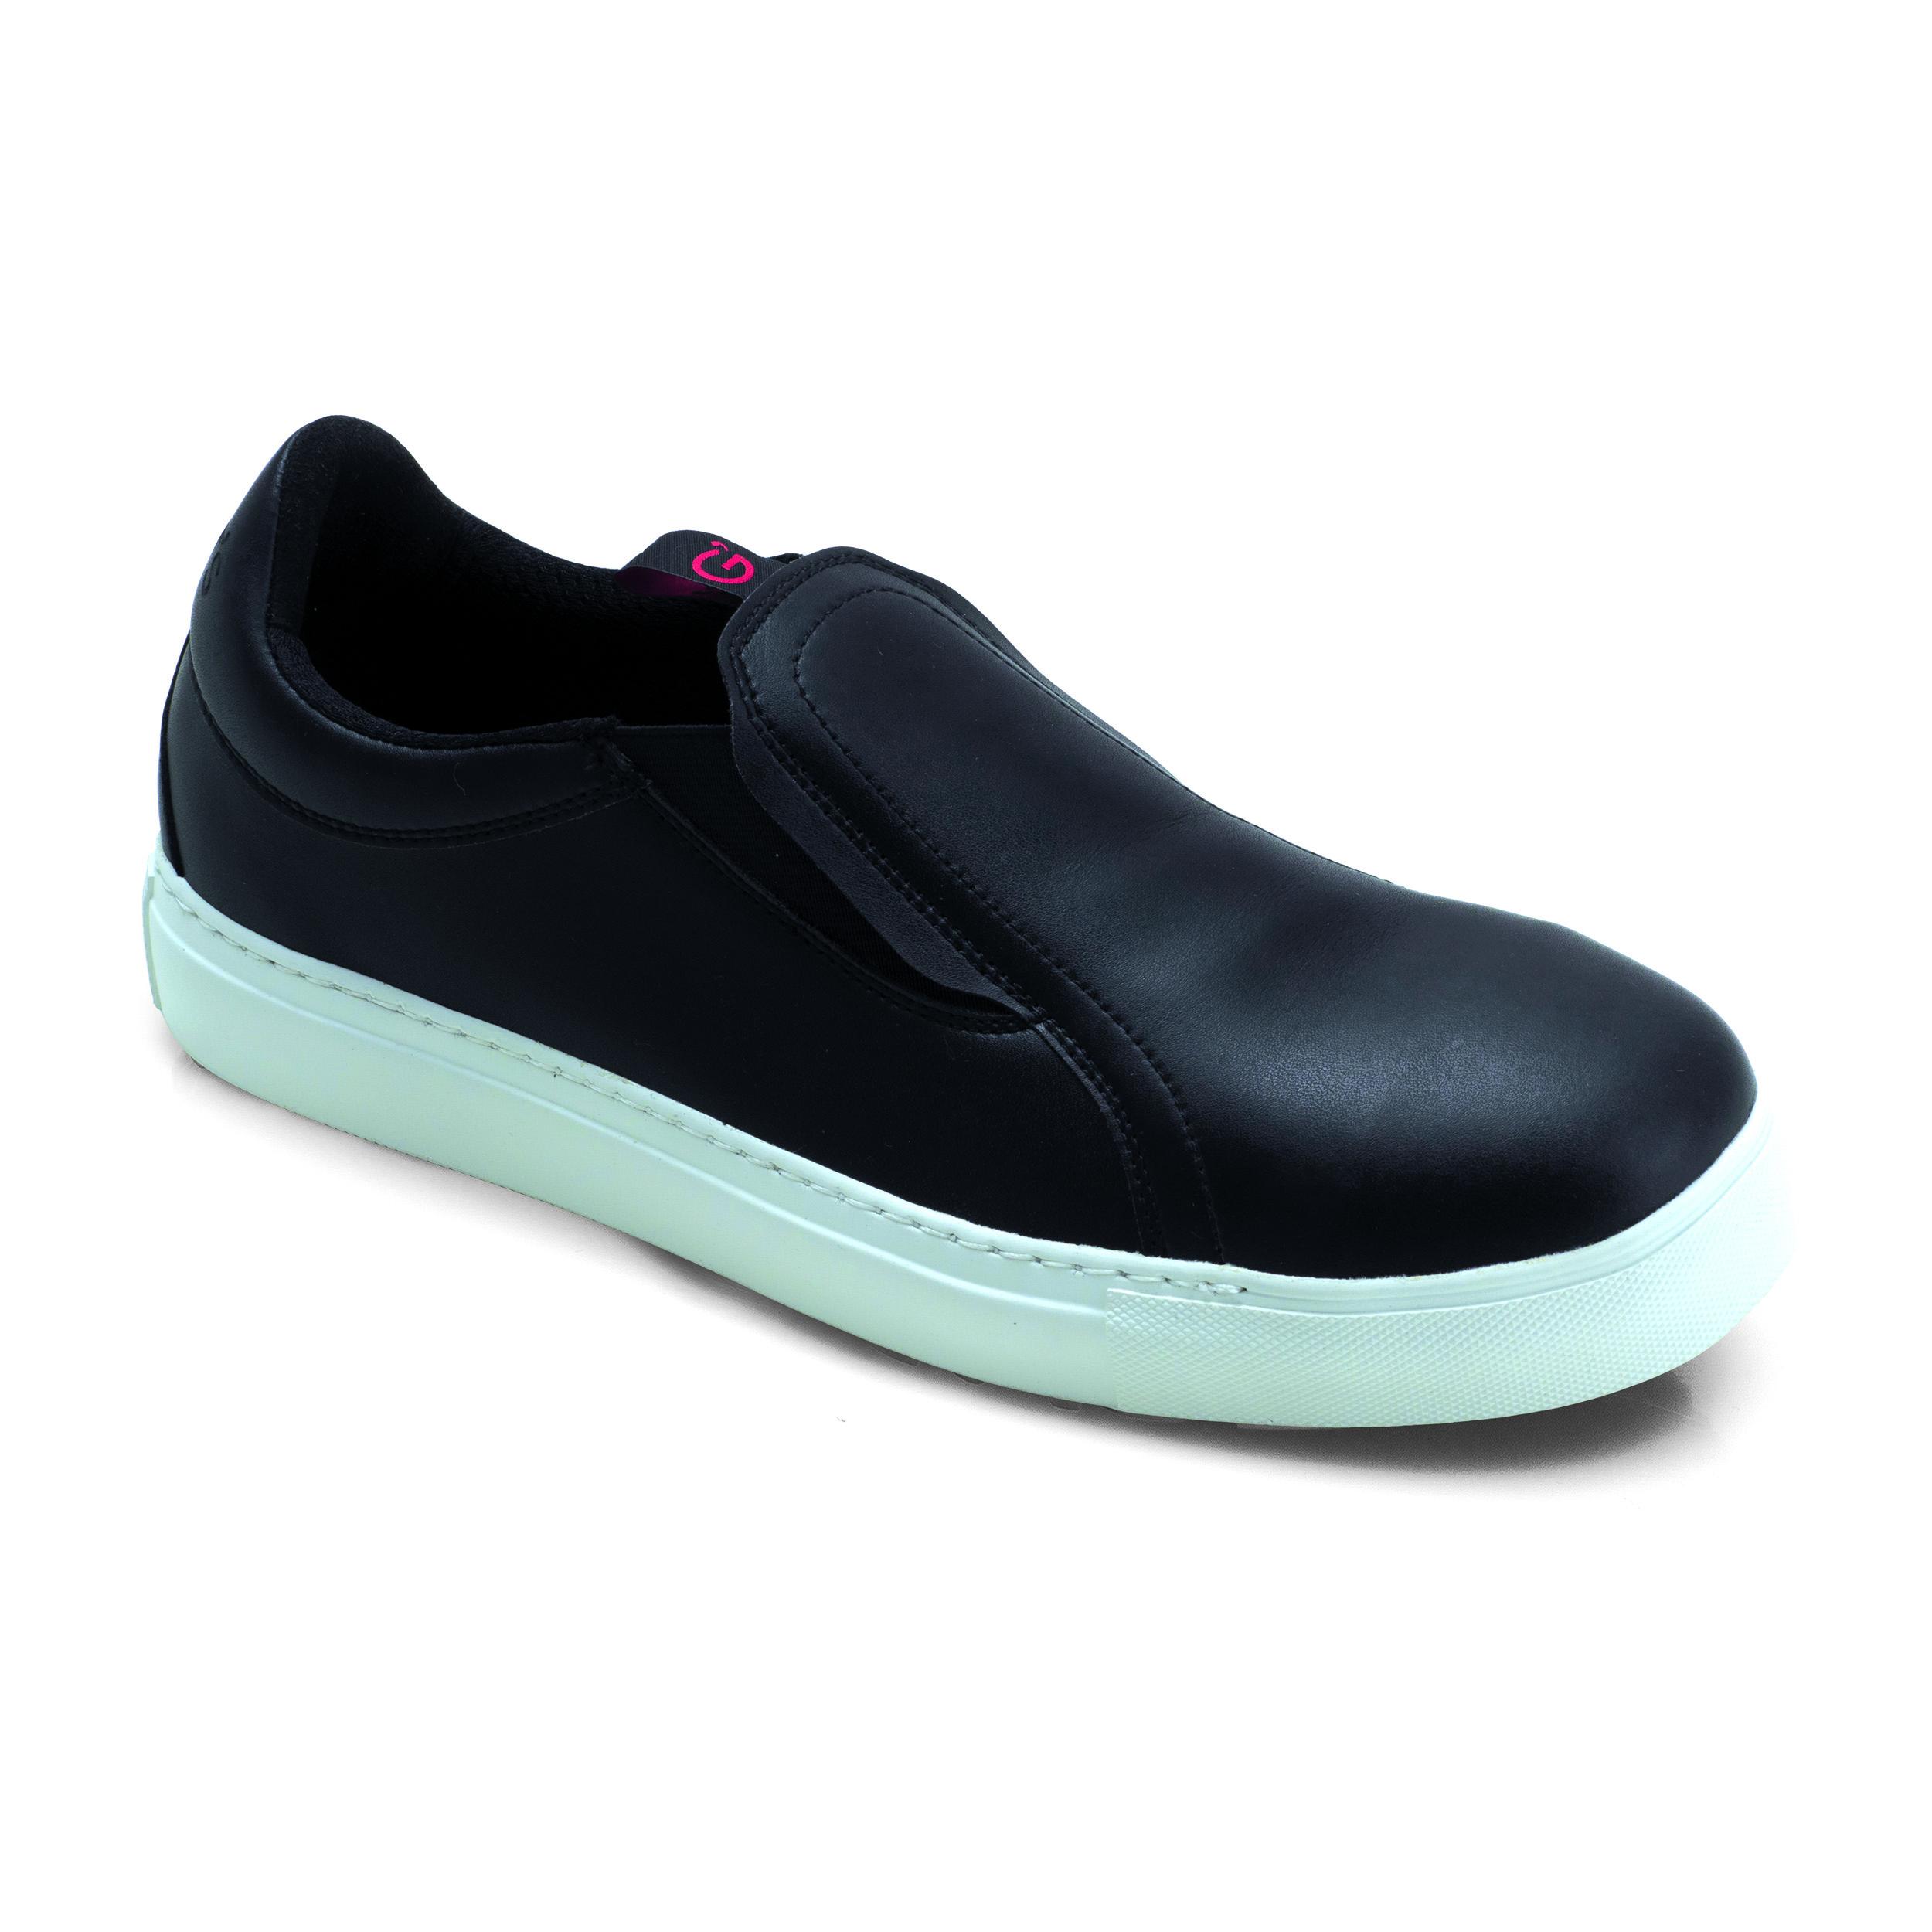 scarpa giblors modello vans